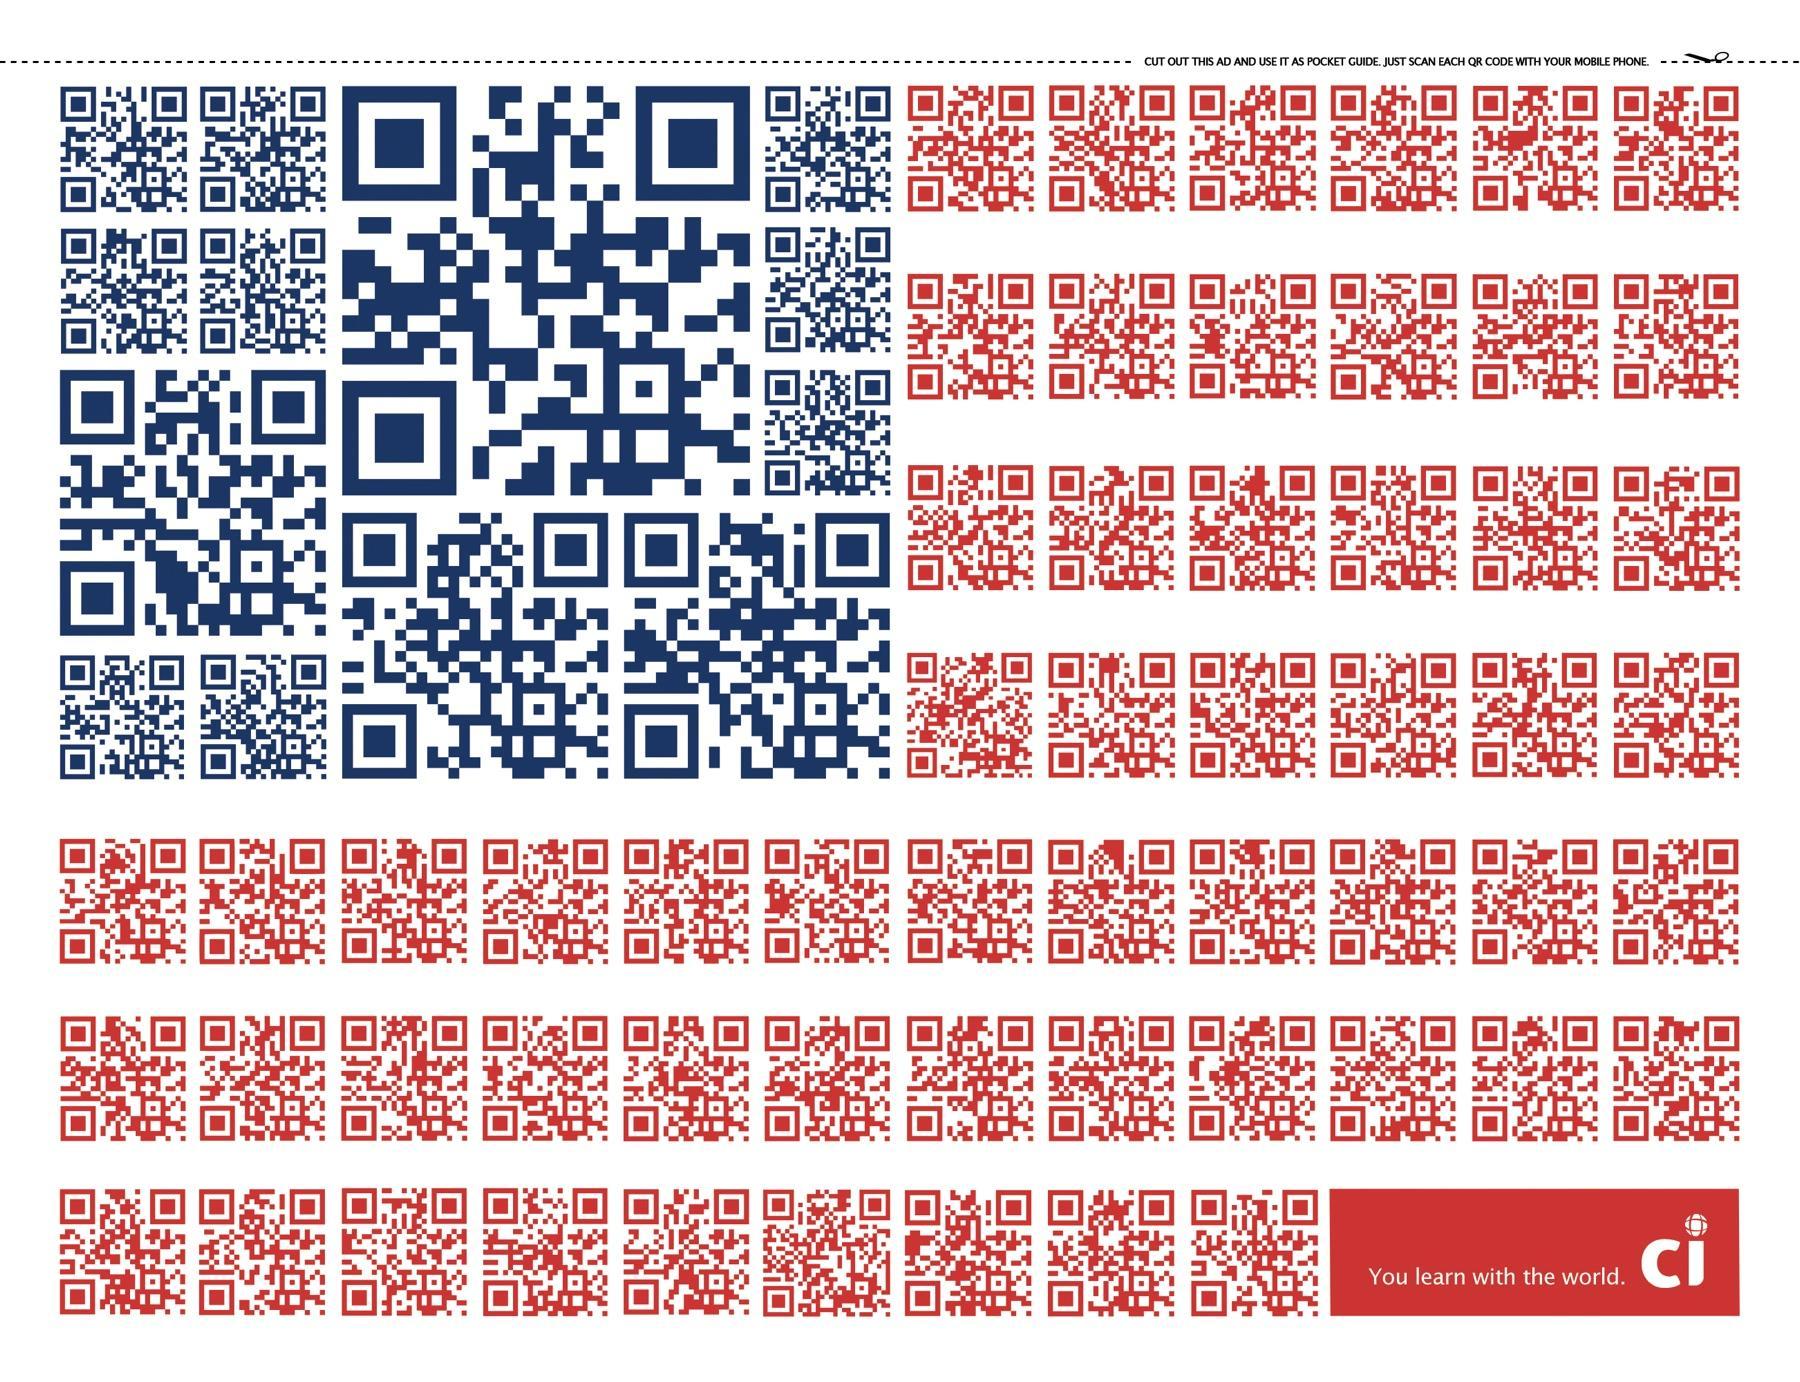 CI Intercâmbio Print Ad -  QR Code Flags, USA